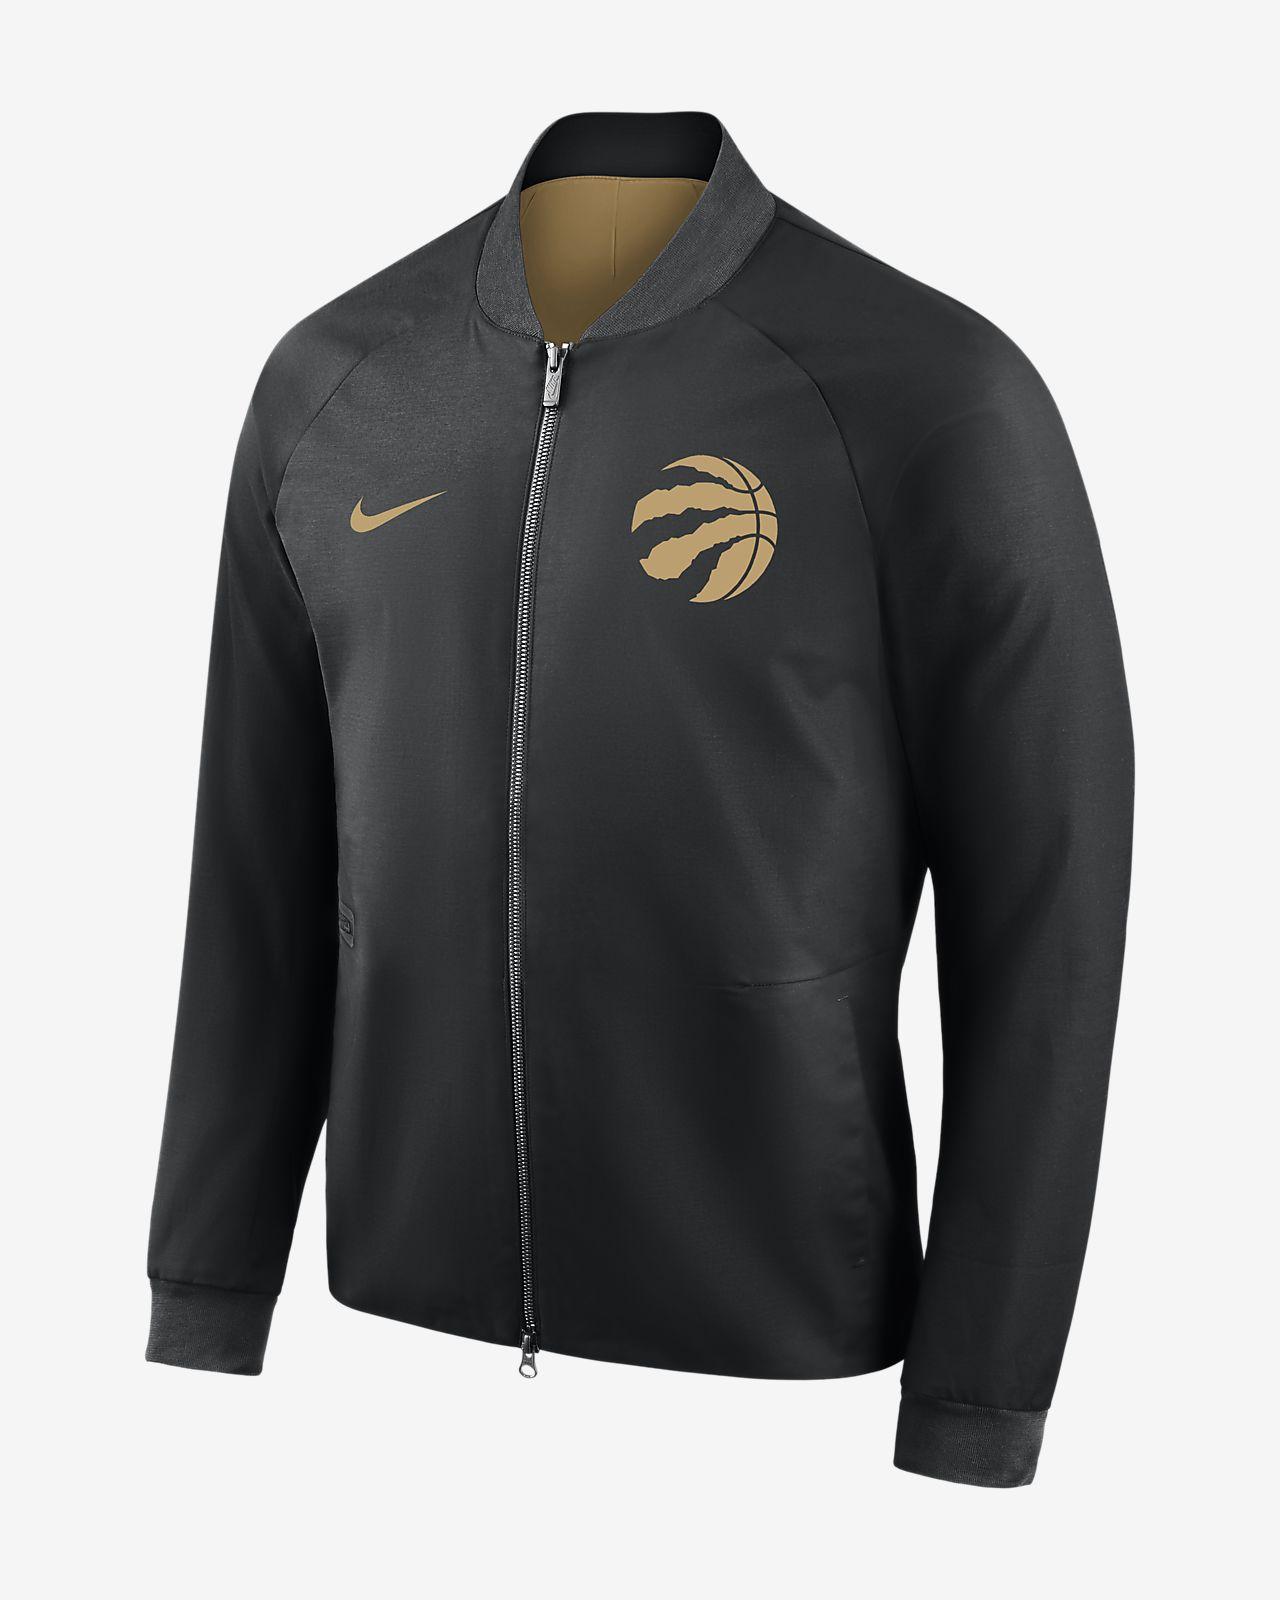 ... Toronto Raptors City Edition Nike Modern Men's NBA Varsity Jacket